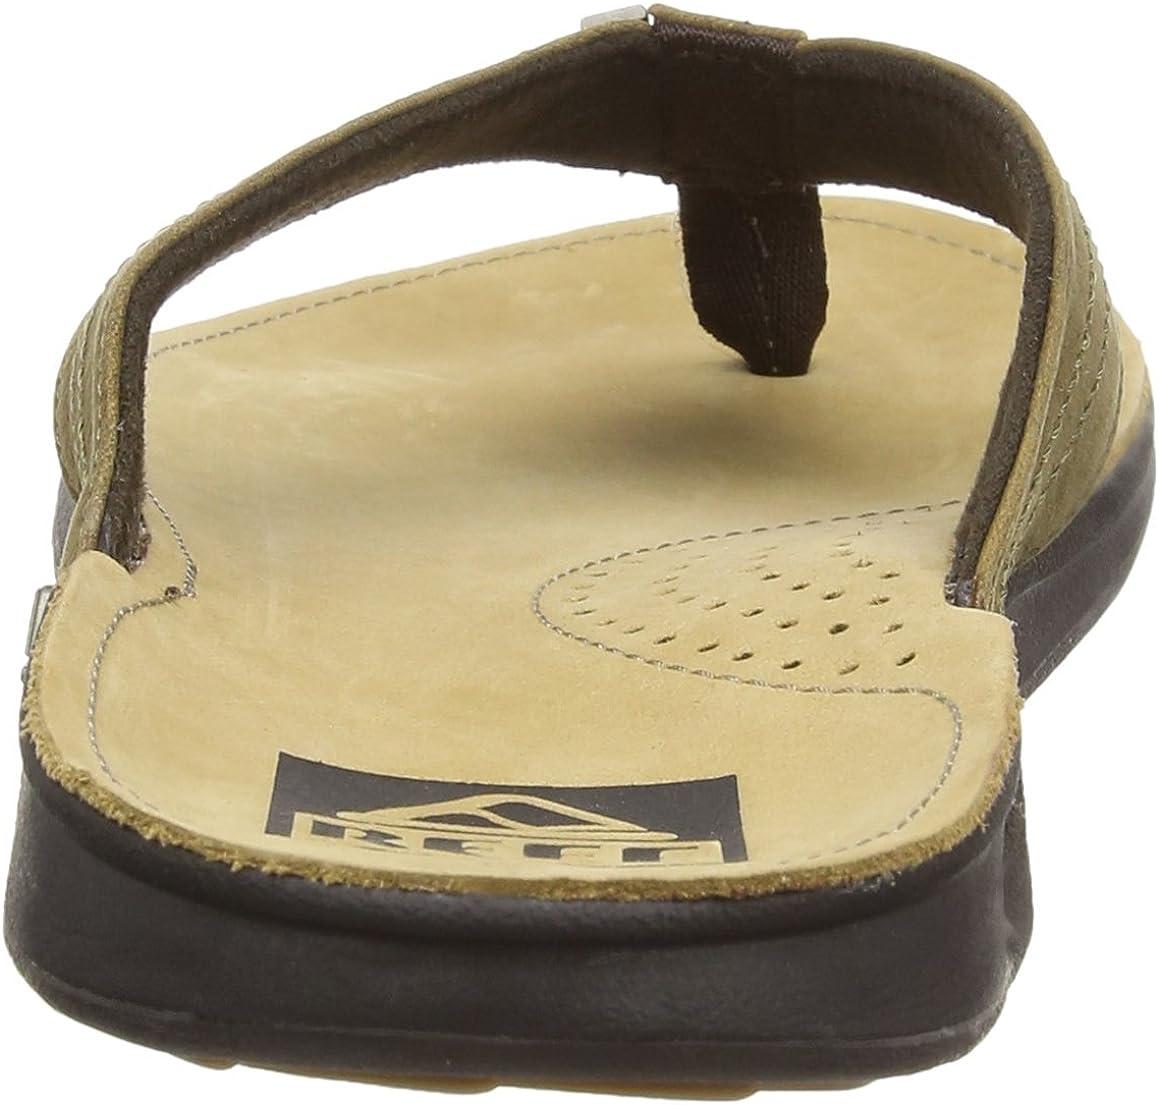 Comfortable Leather Flip Flops for Men Reef Mens Leather Sandals J-Bay III